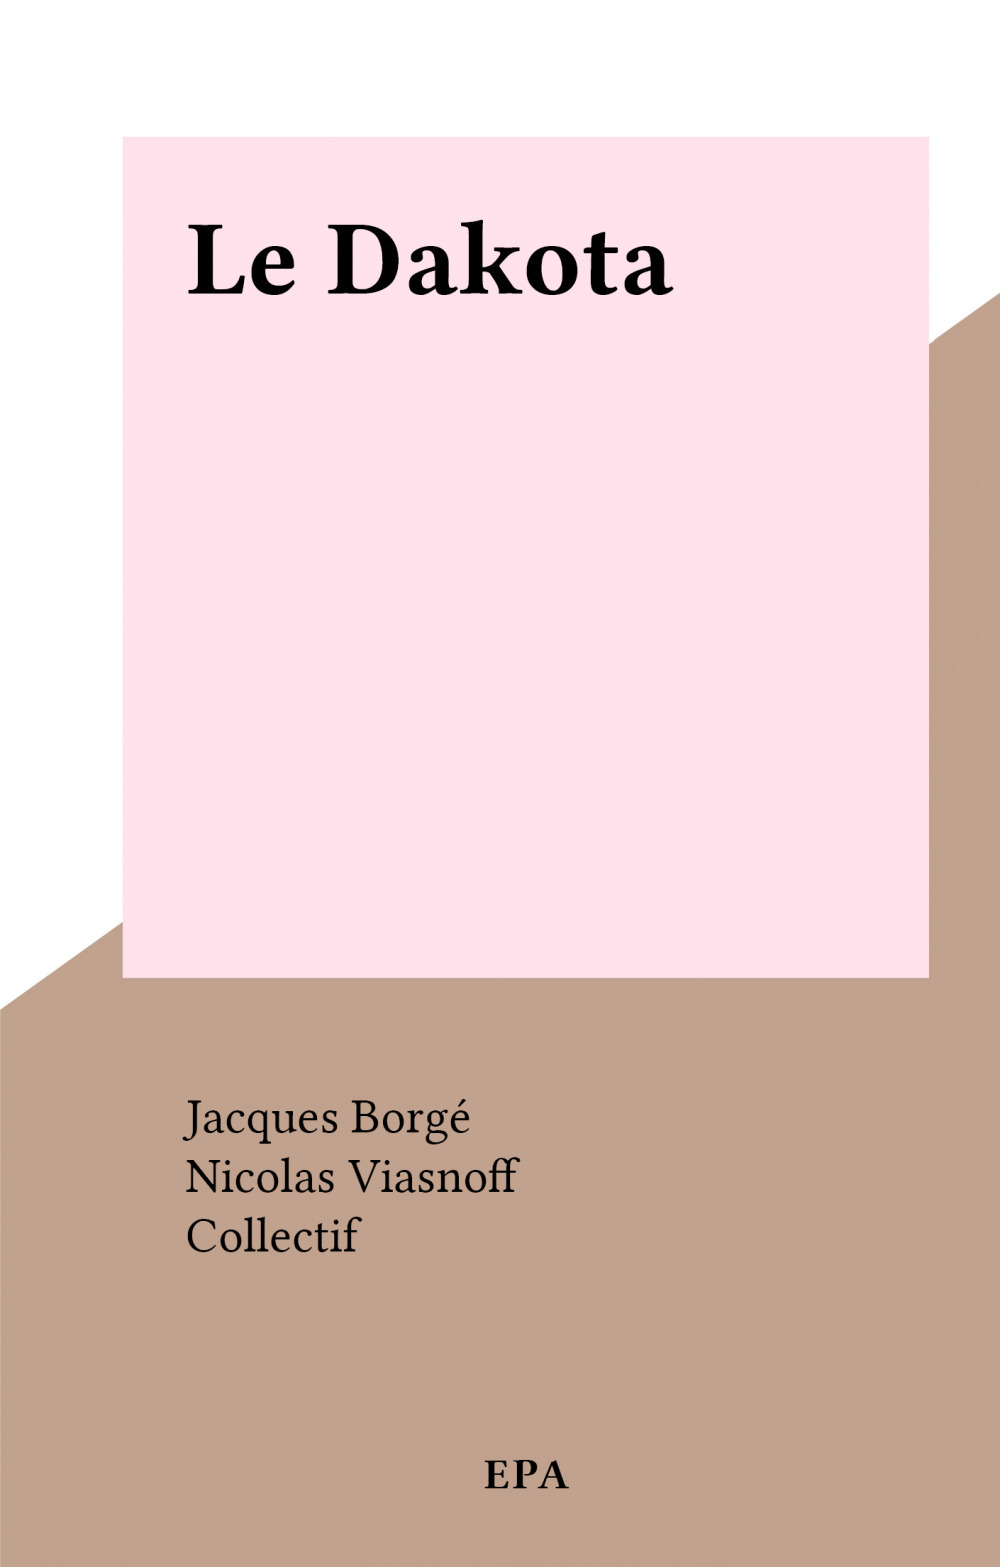 Le Dakota  - Nicolas Viasnoff  - Jacques Borge